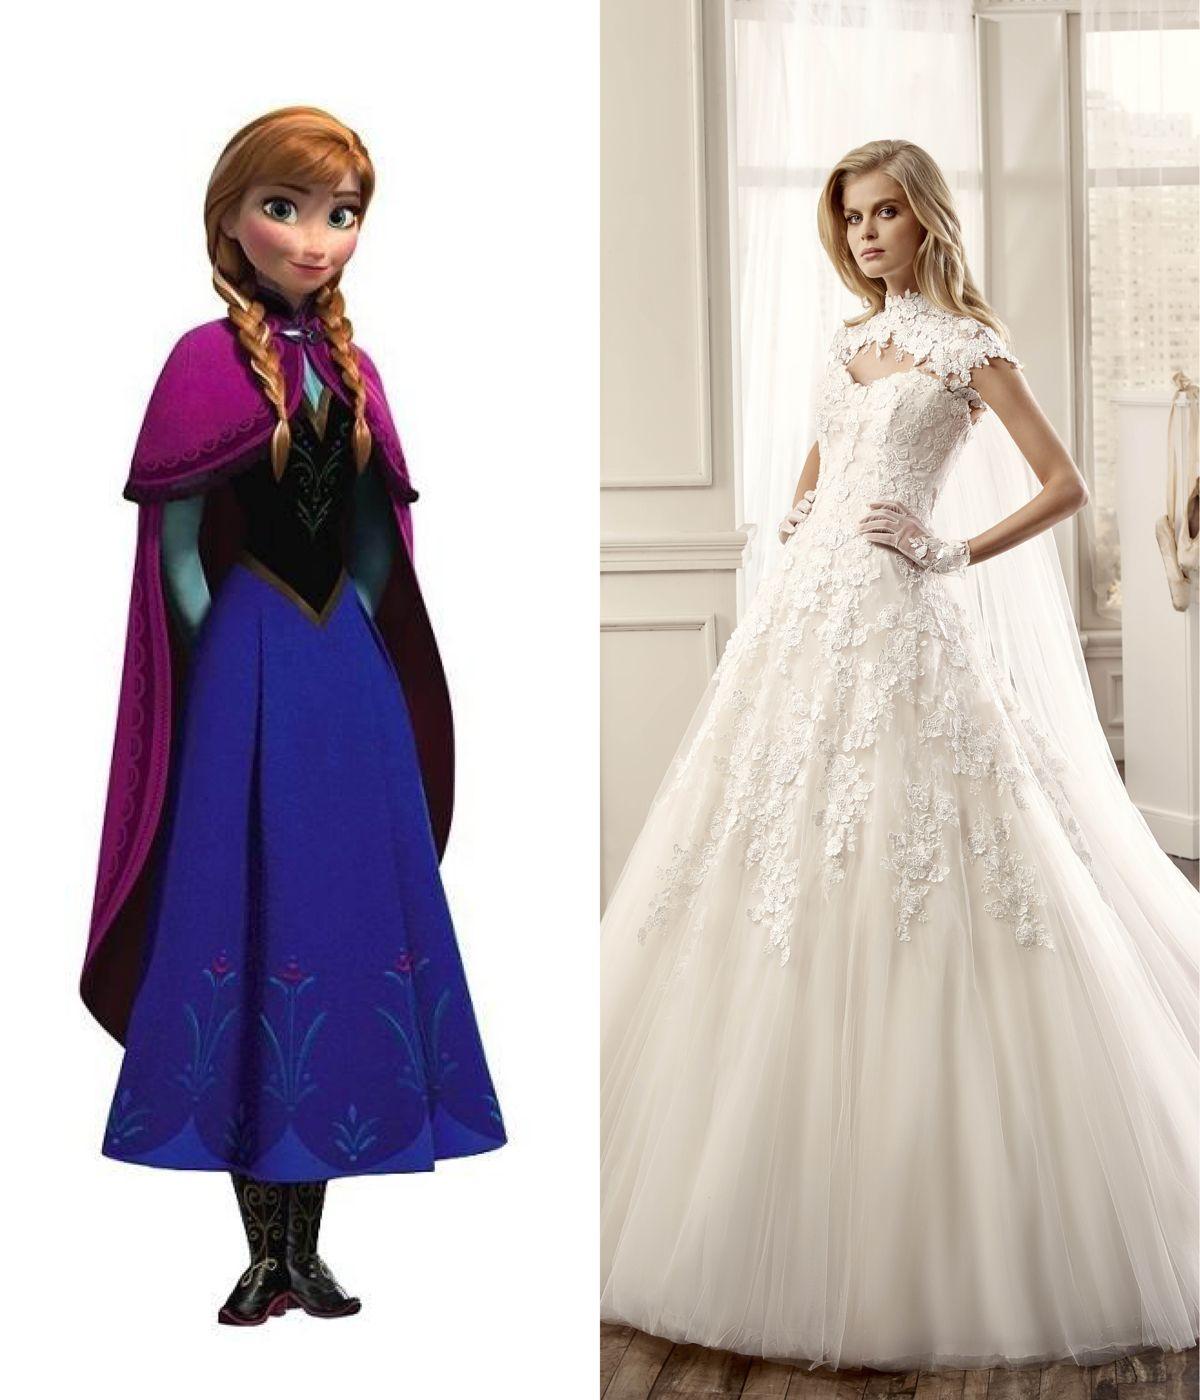 Anna Disney Wedding Dress Style Niab16107 By Nicole Spose Weddingdress: Anna Inspired Wedding Dress At Reisefeber.org